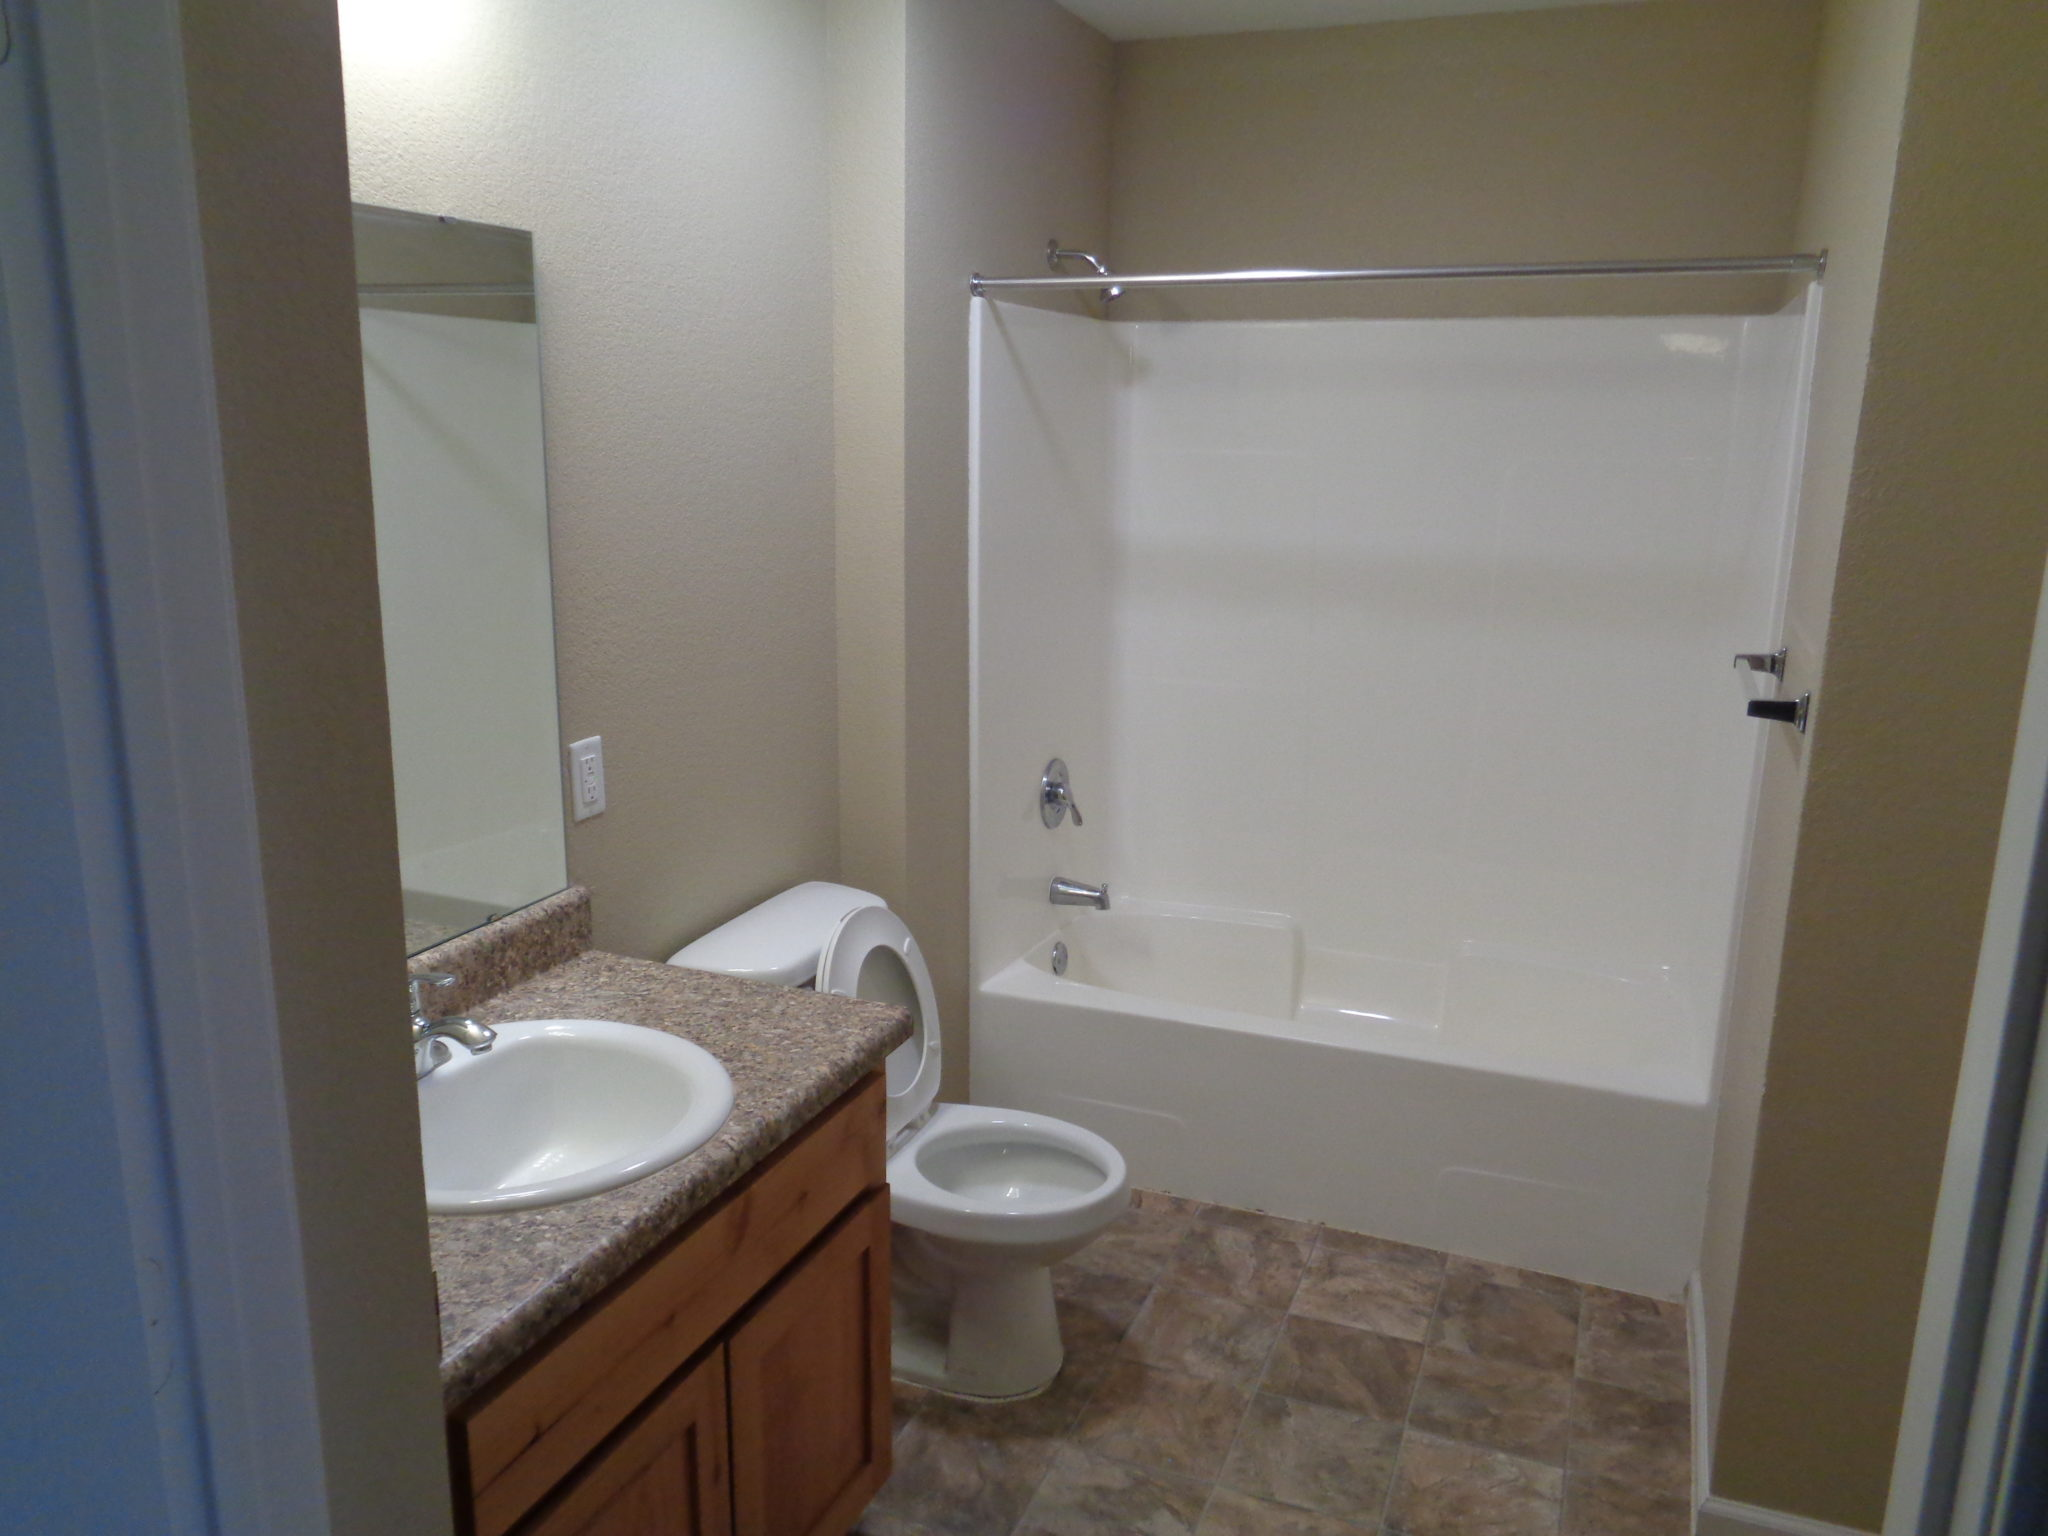 Ridgway Villas Raymore MO bathroom